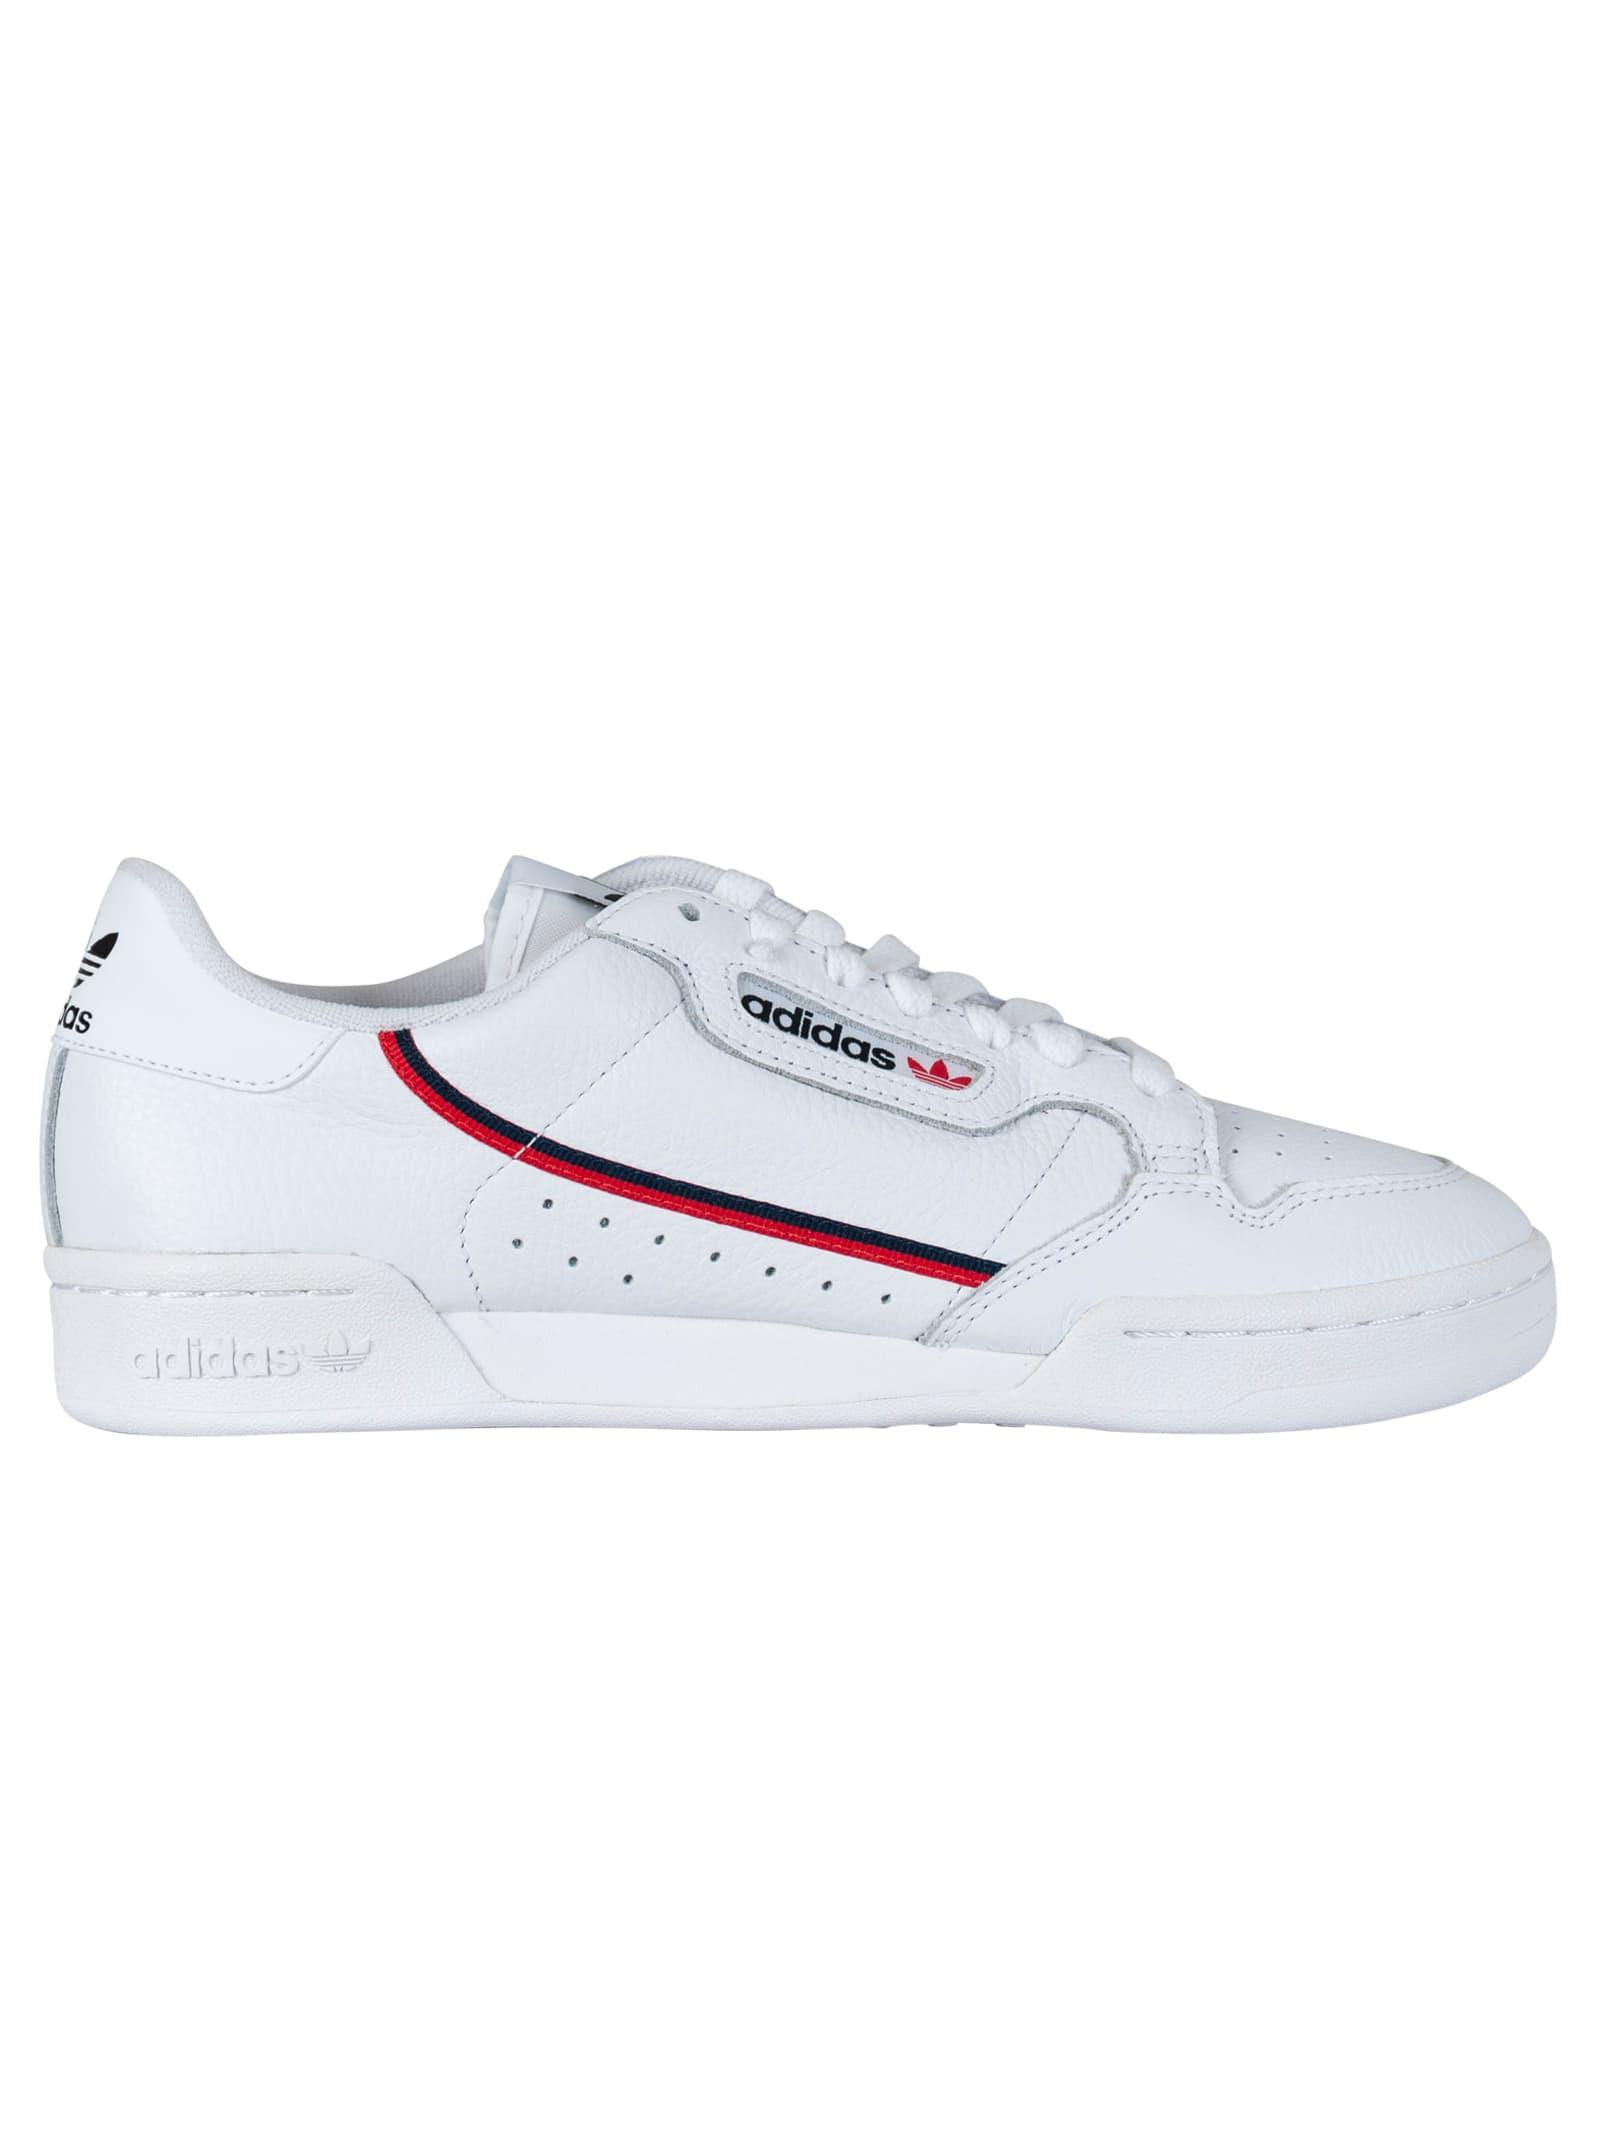 adidas Continental 80 G27706 Ftwwht/Scarle/Conavy